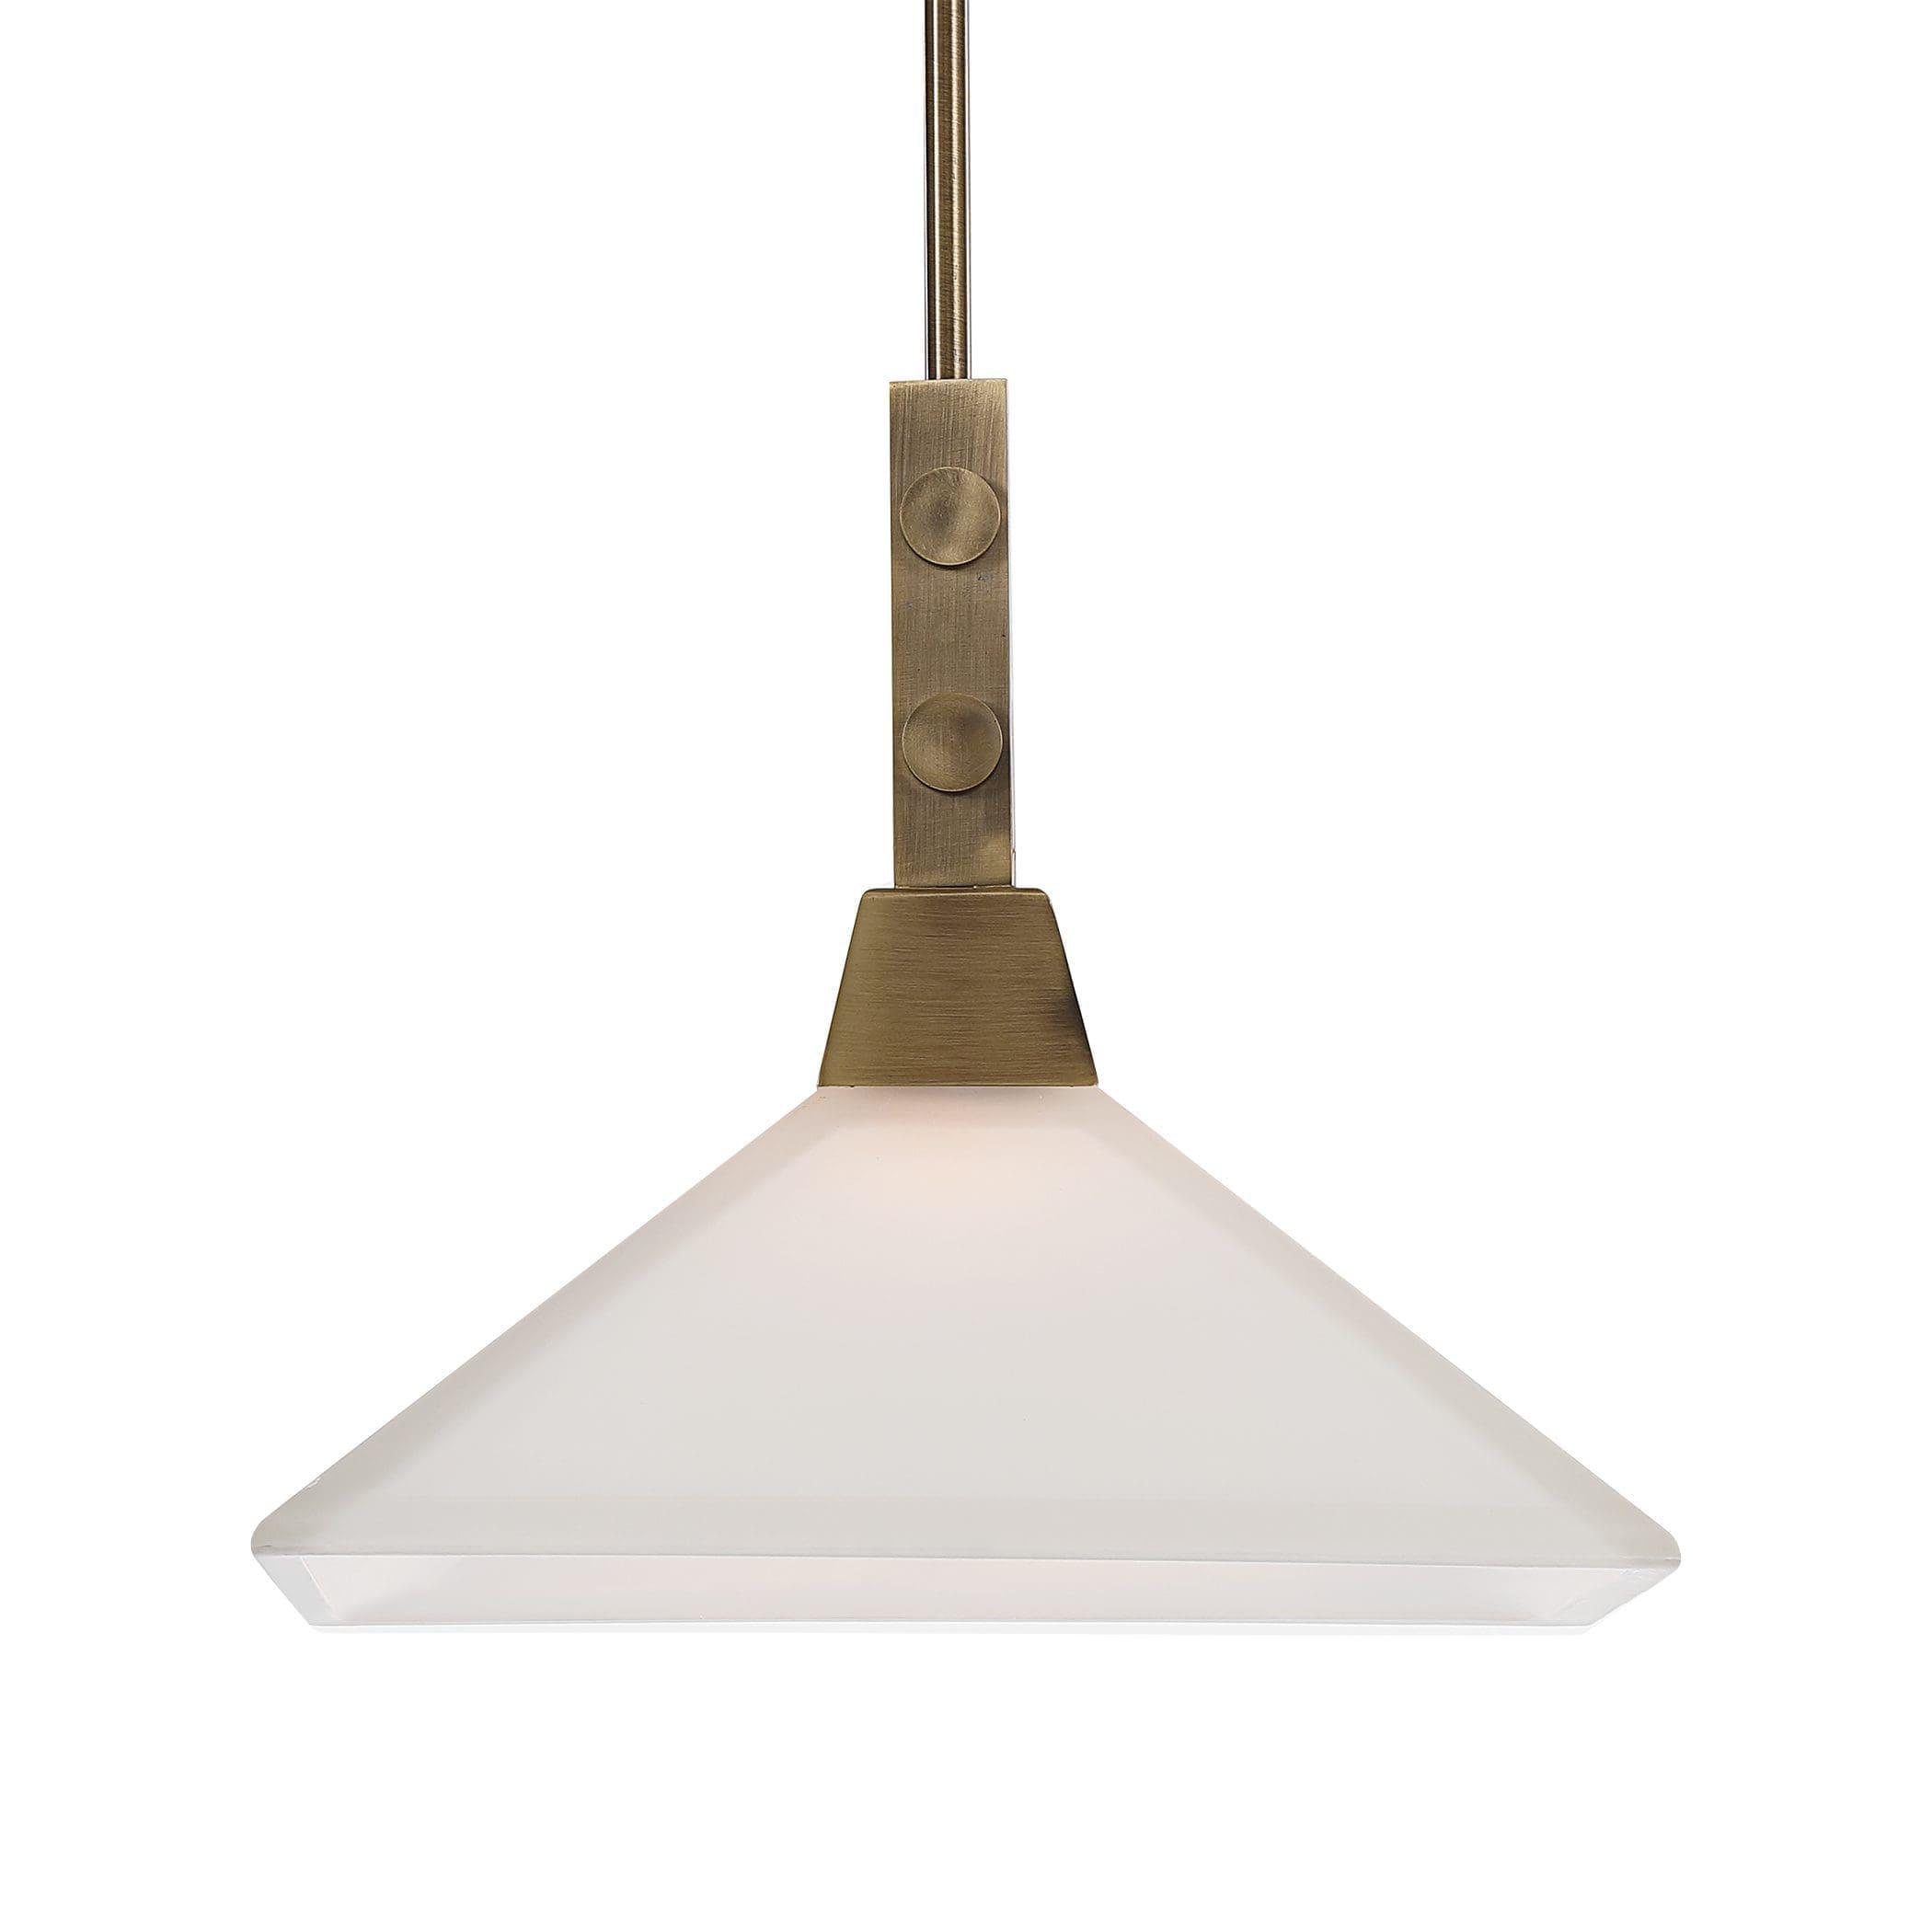 Uttermost Brookdale Industrial 1 Light Pendant